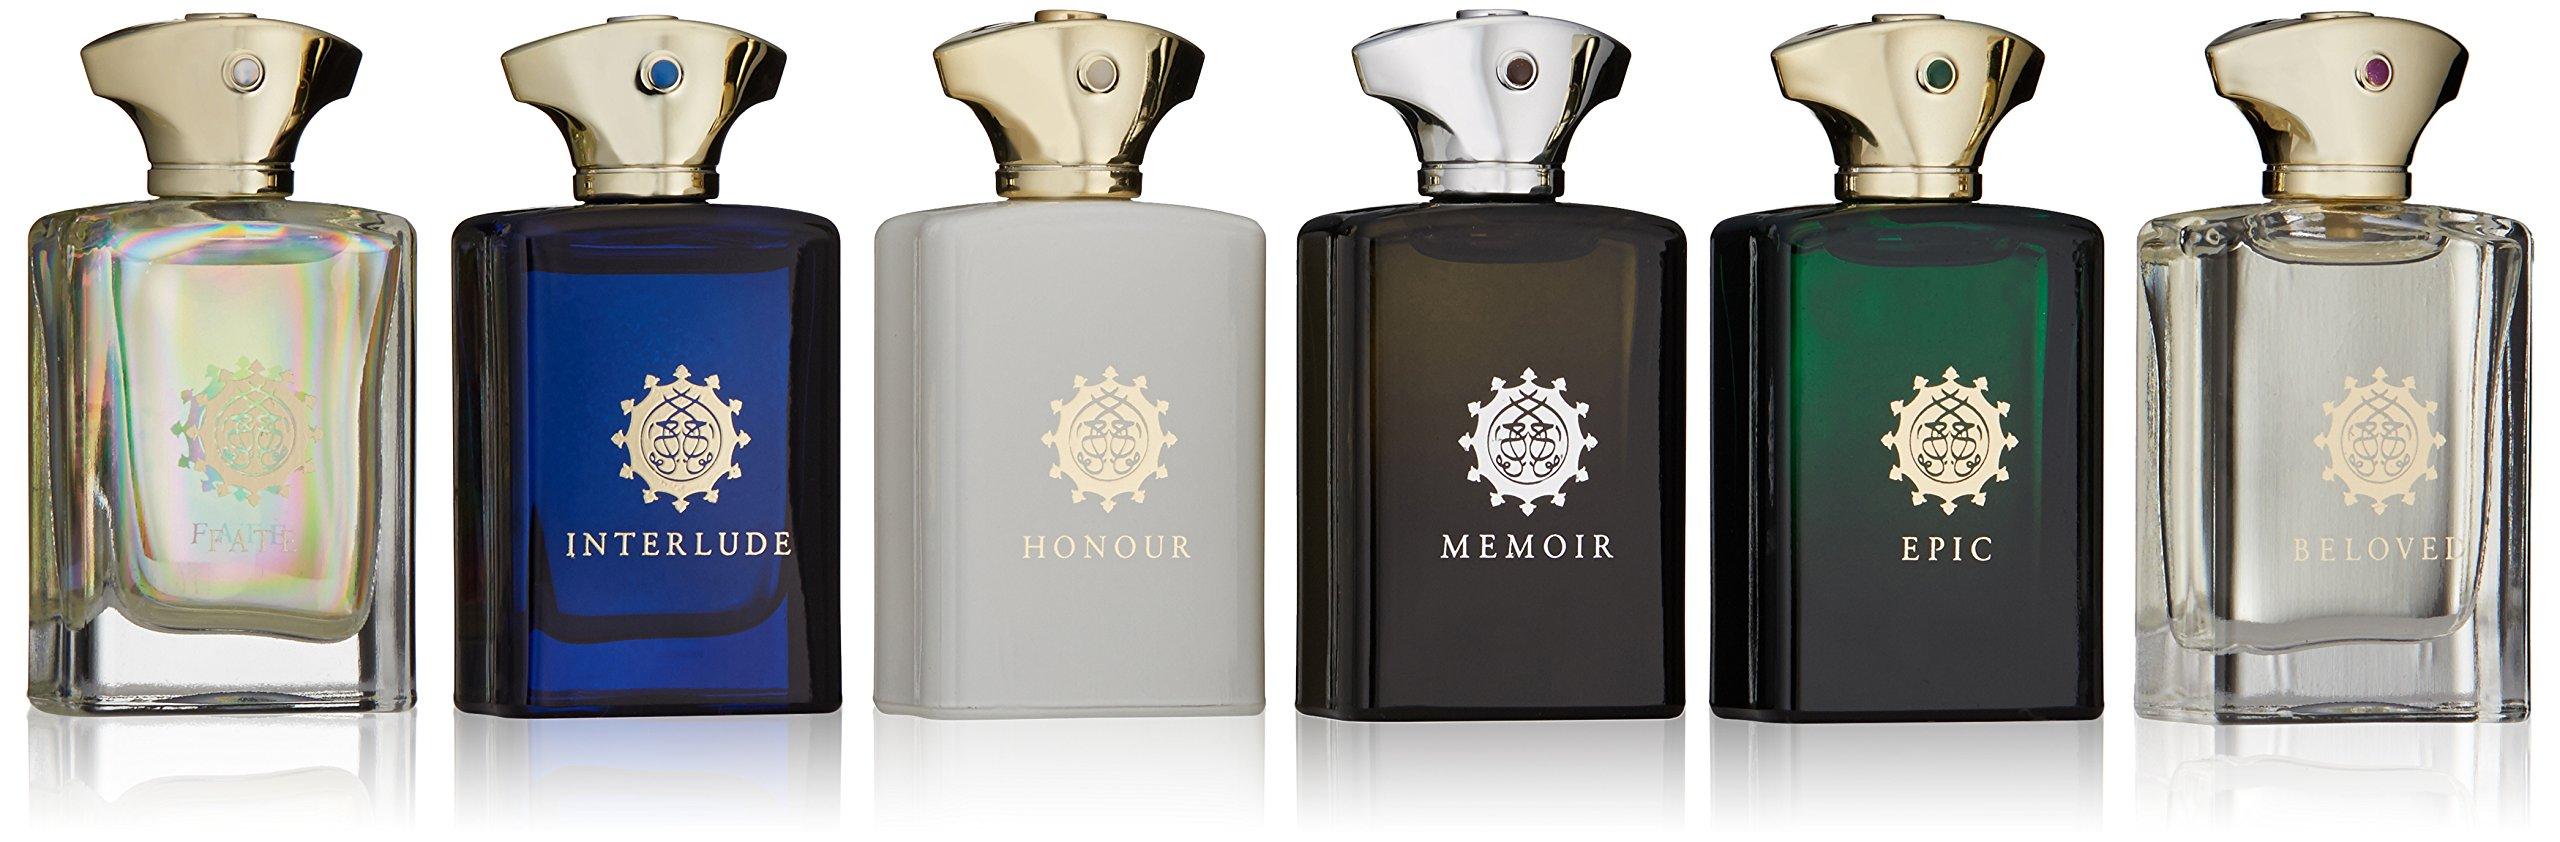 AMOUAGE Miniatures Bottles Collection Modern Men's Fragrance Set